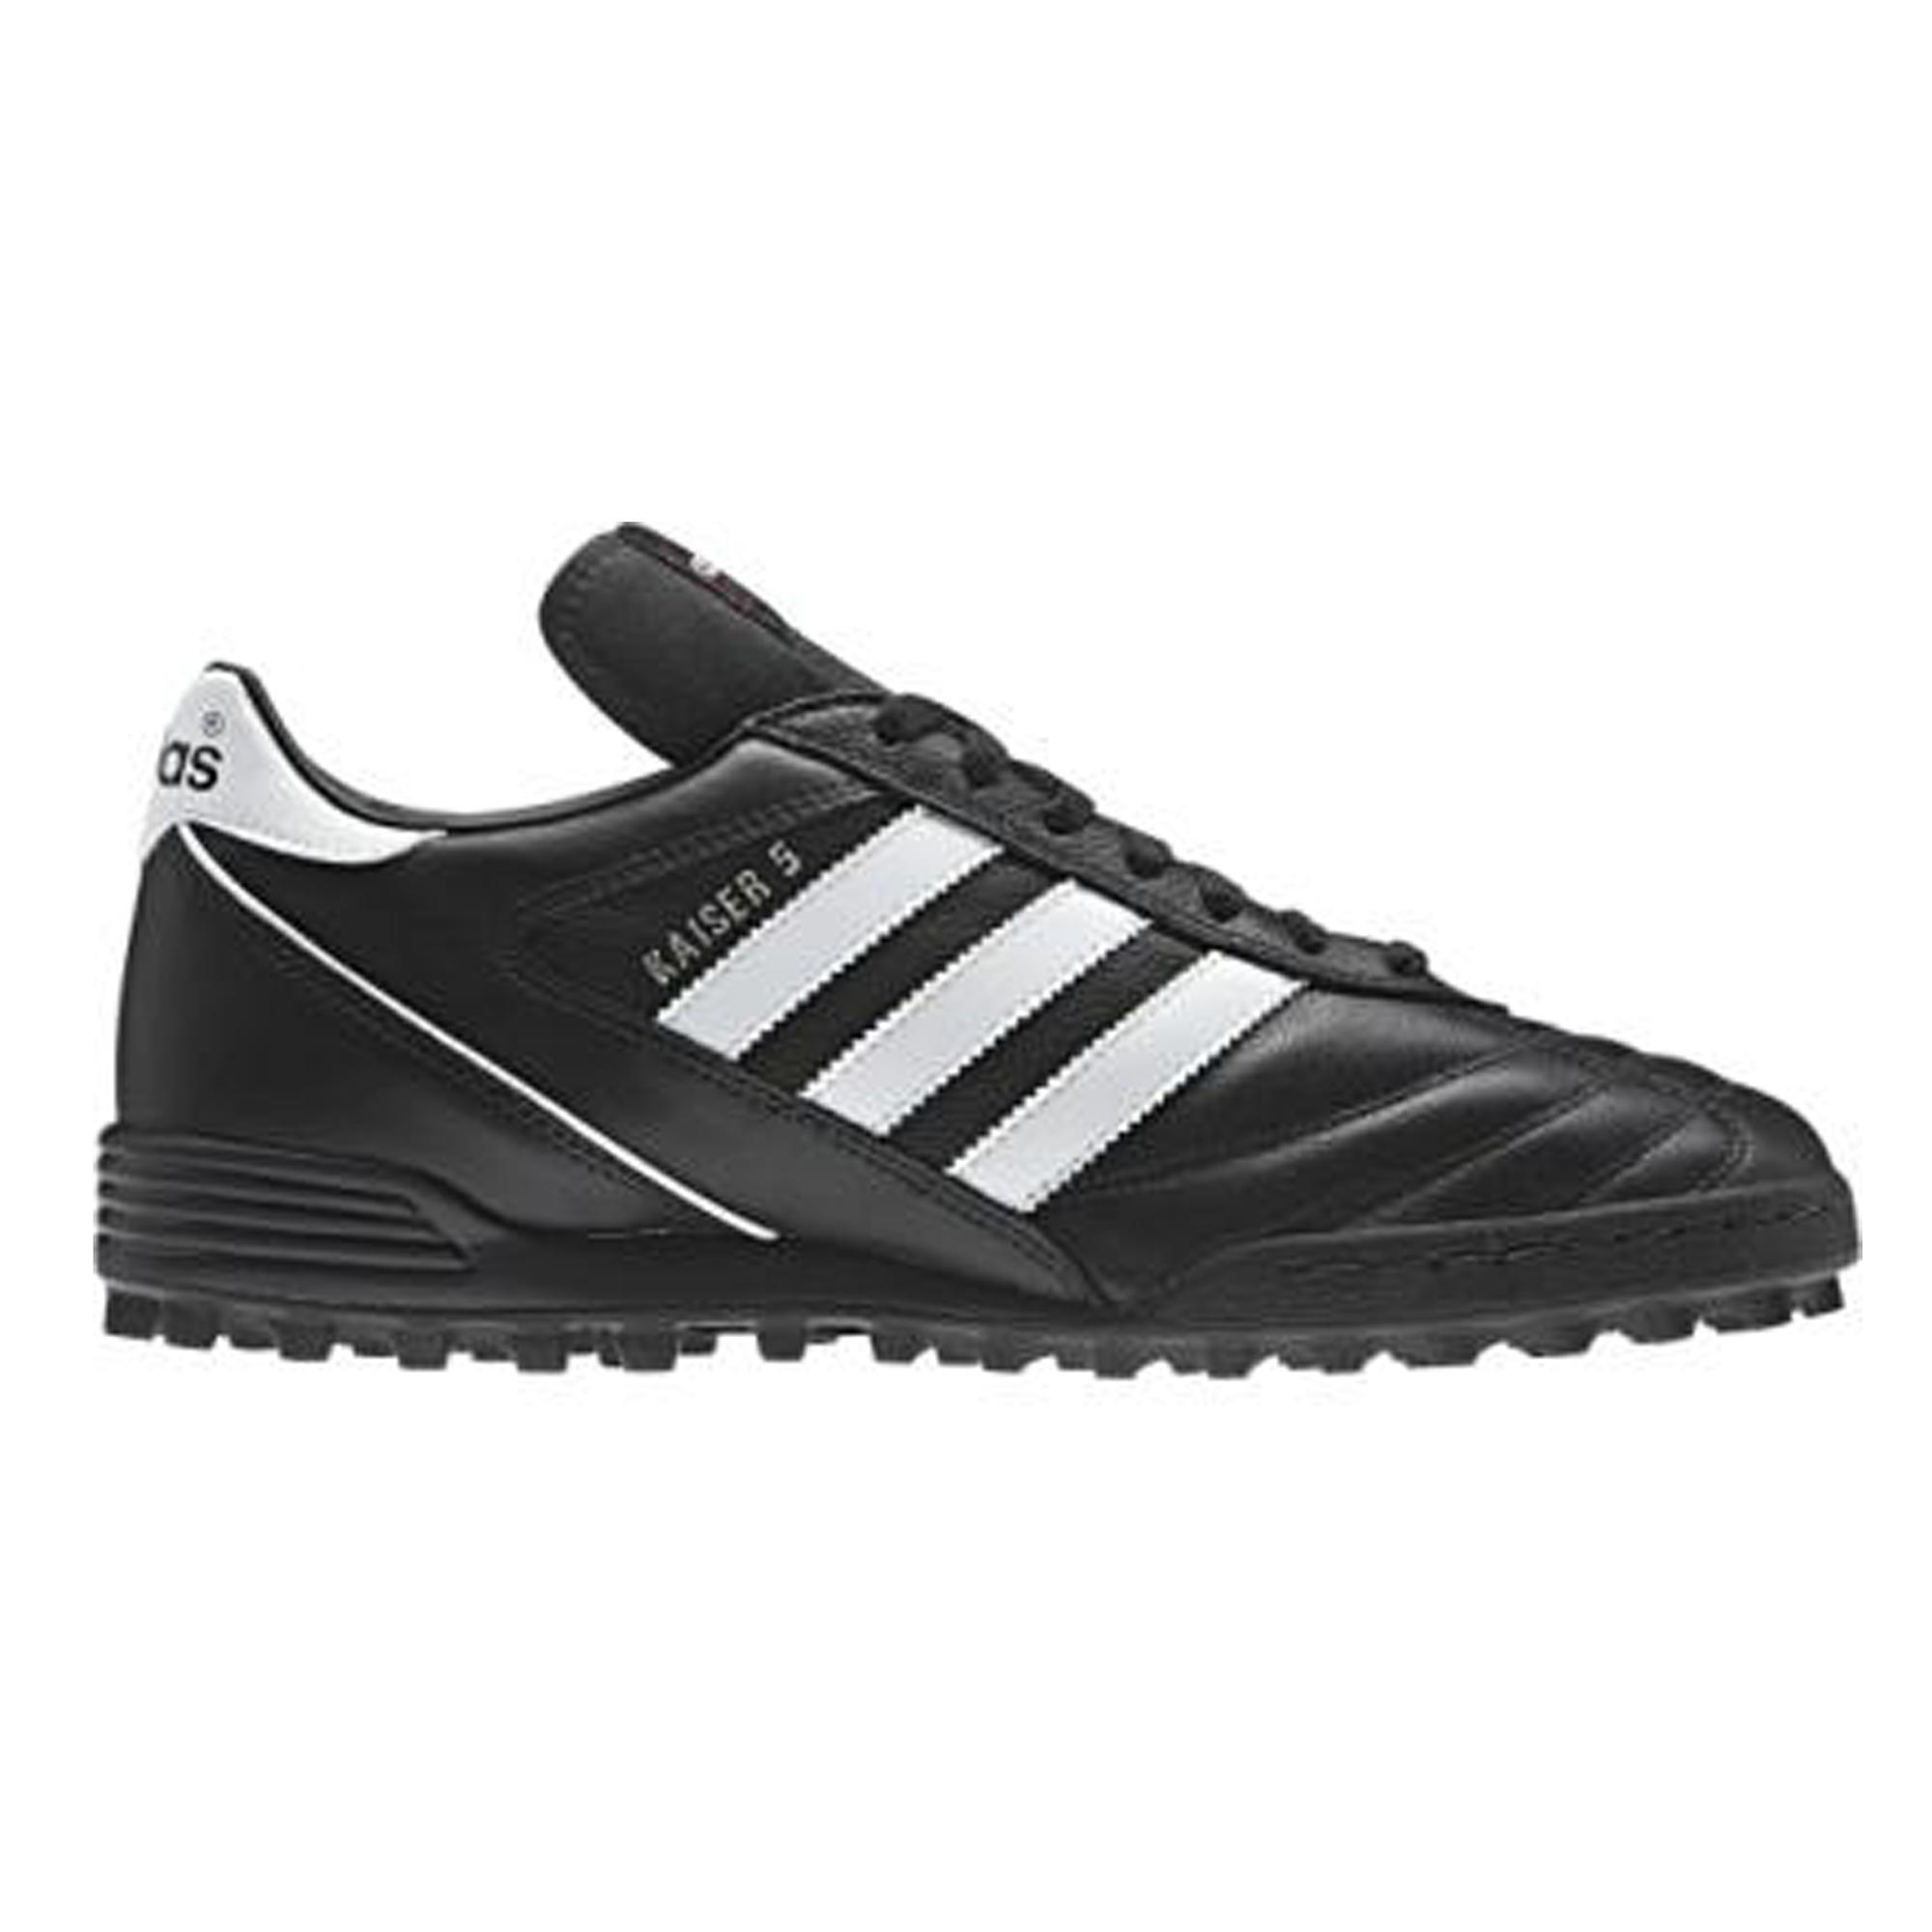 Chaussure football Adidas Kaiser 5 Team HG adulte noire